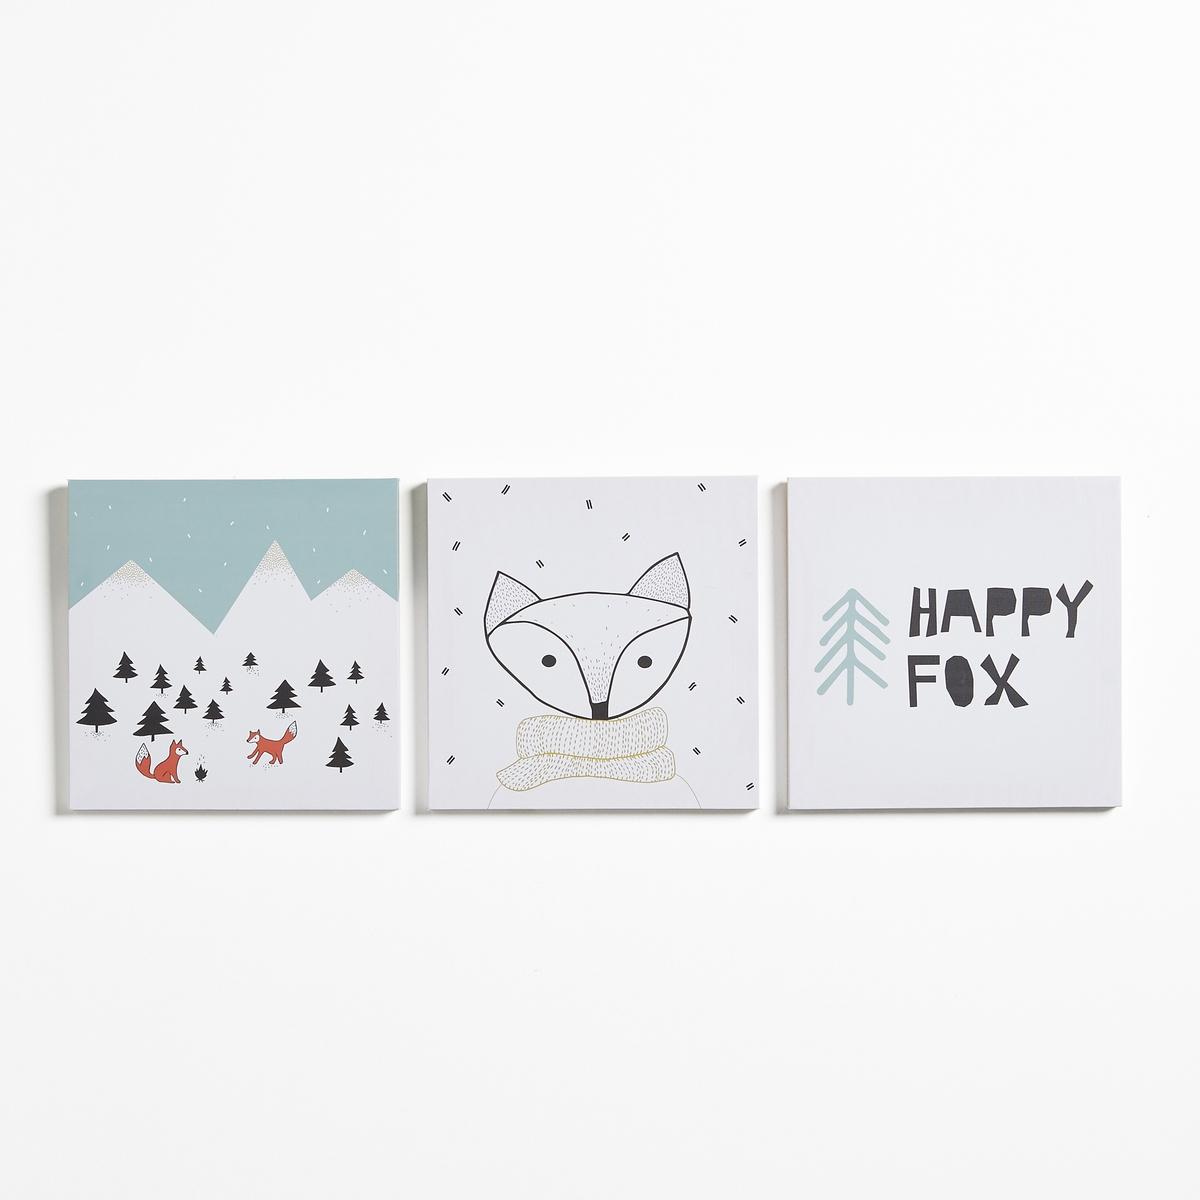 Комплект из 3 декоративных детских картин COVENT